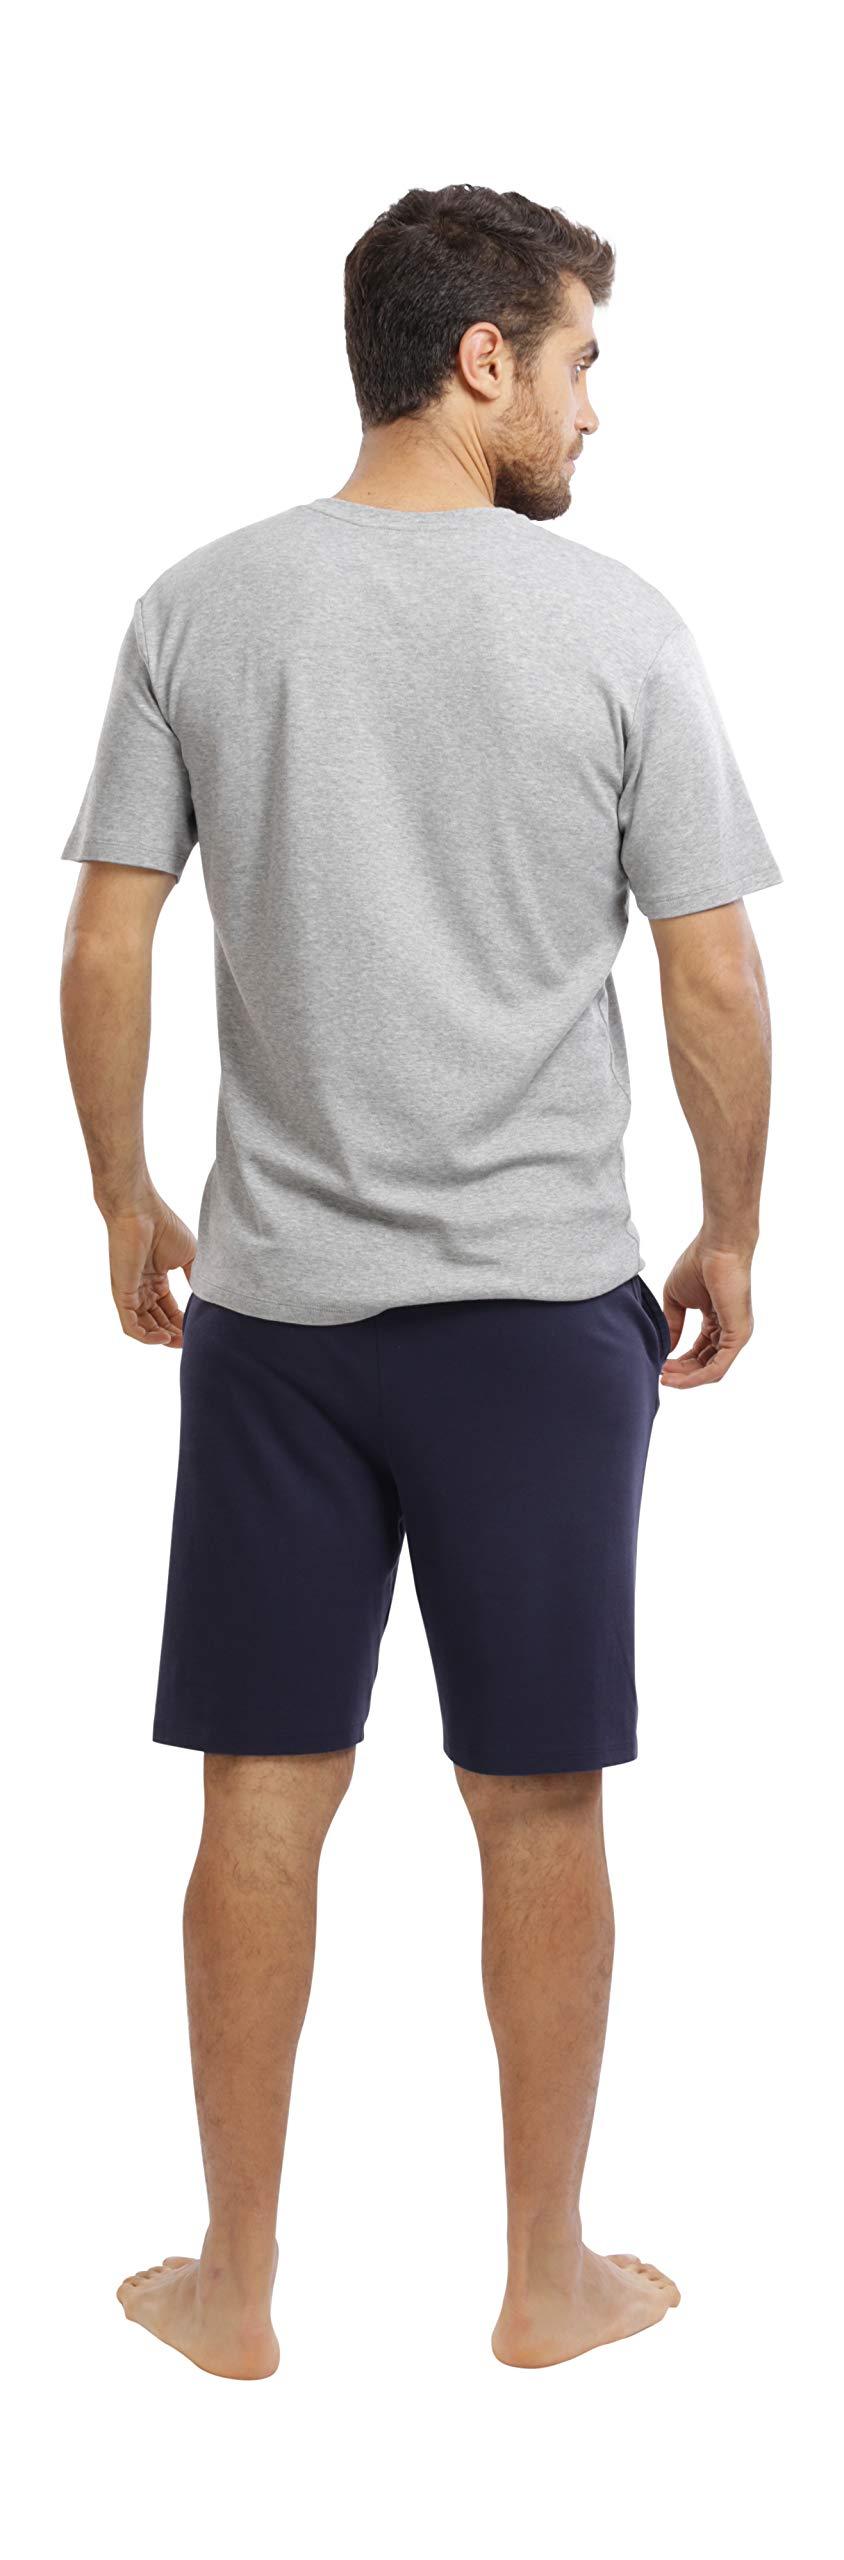 jijamas Incredibly Soft Pima Cotton Men's Pajamas Set - The Weekender Shorts in Navy and Heather Grey by jijamas (Image #3)